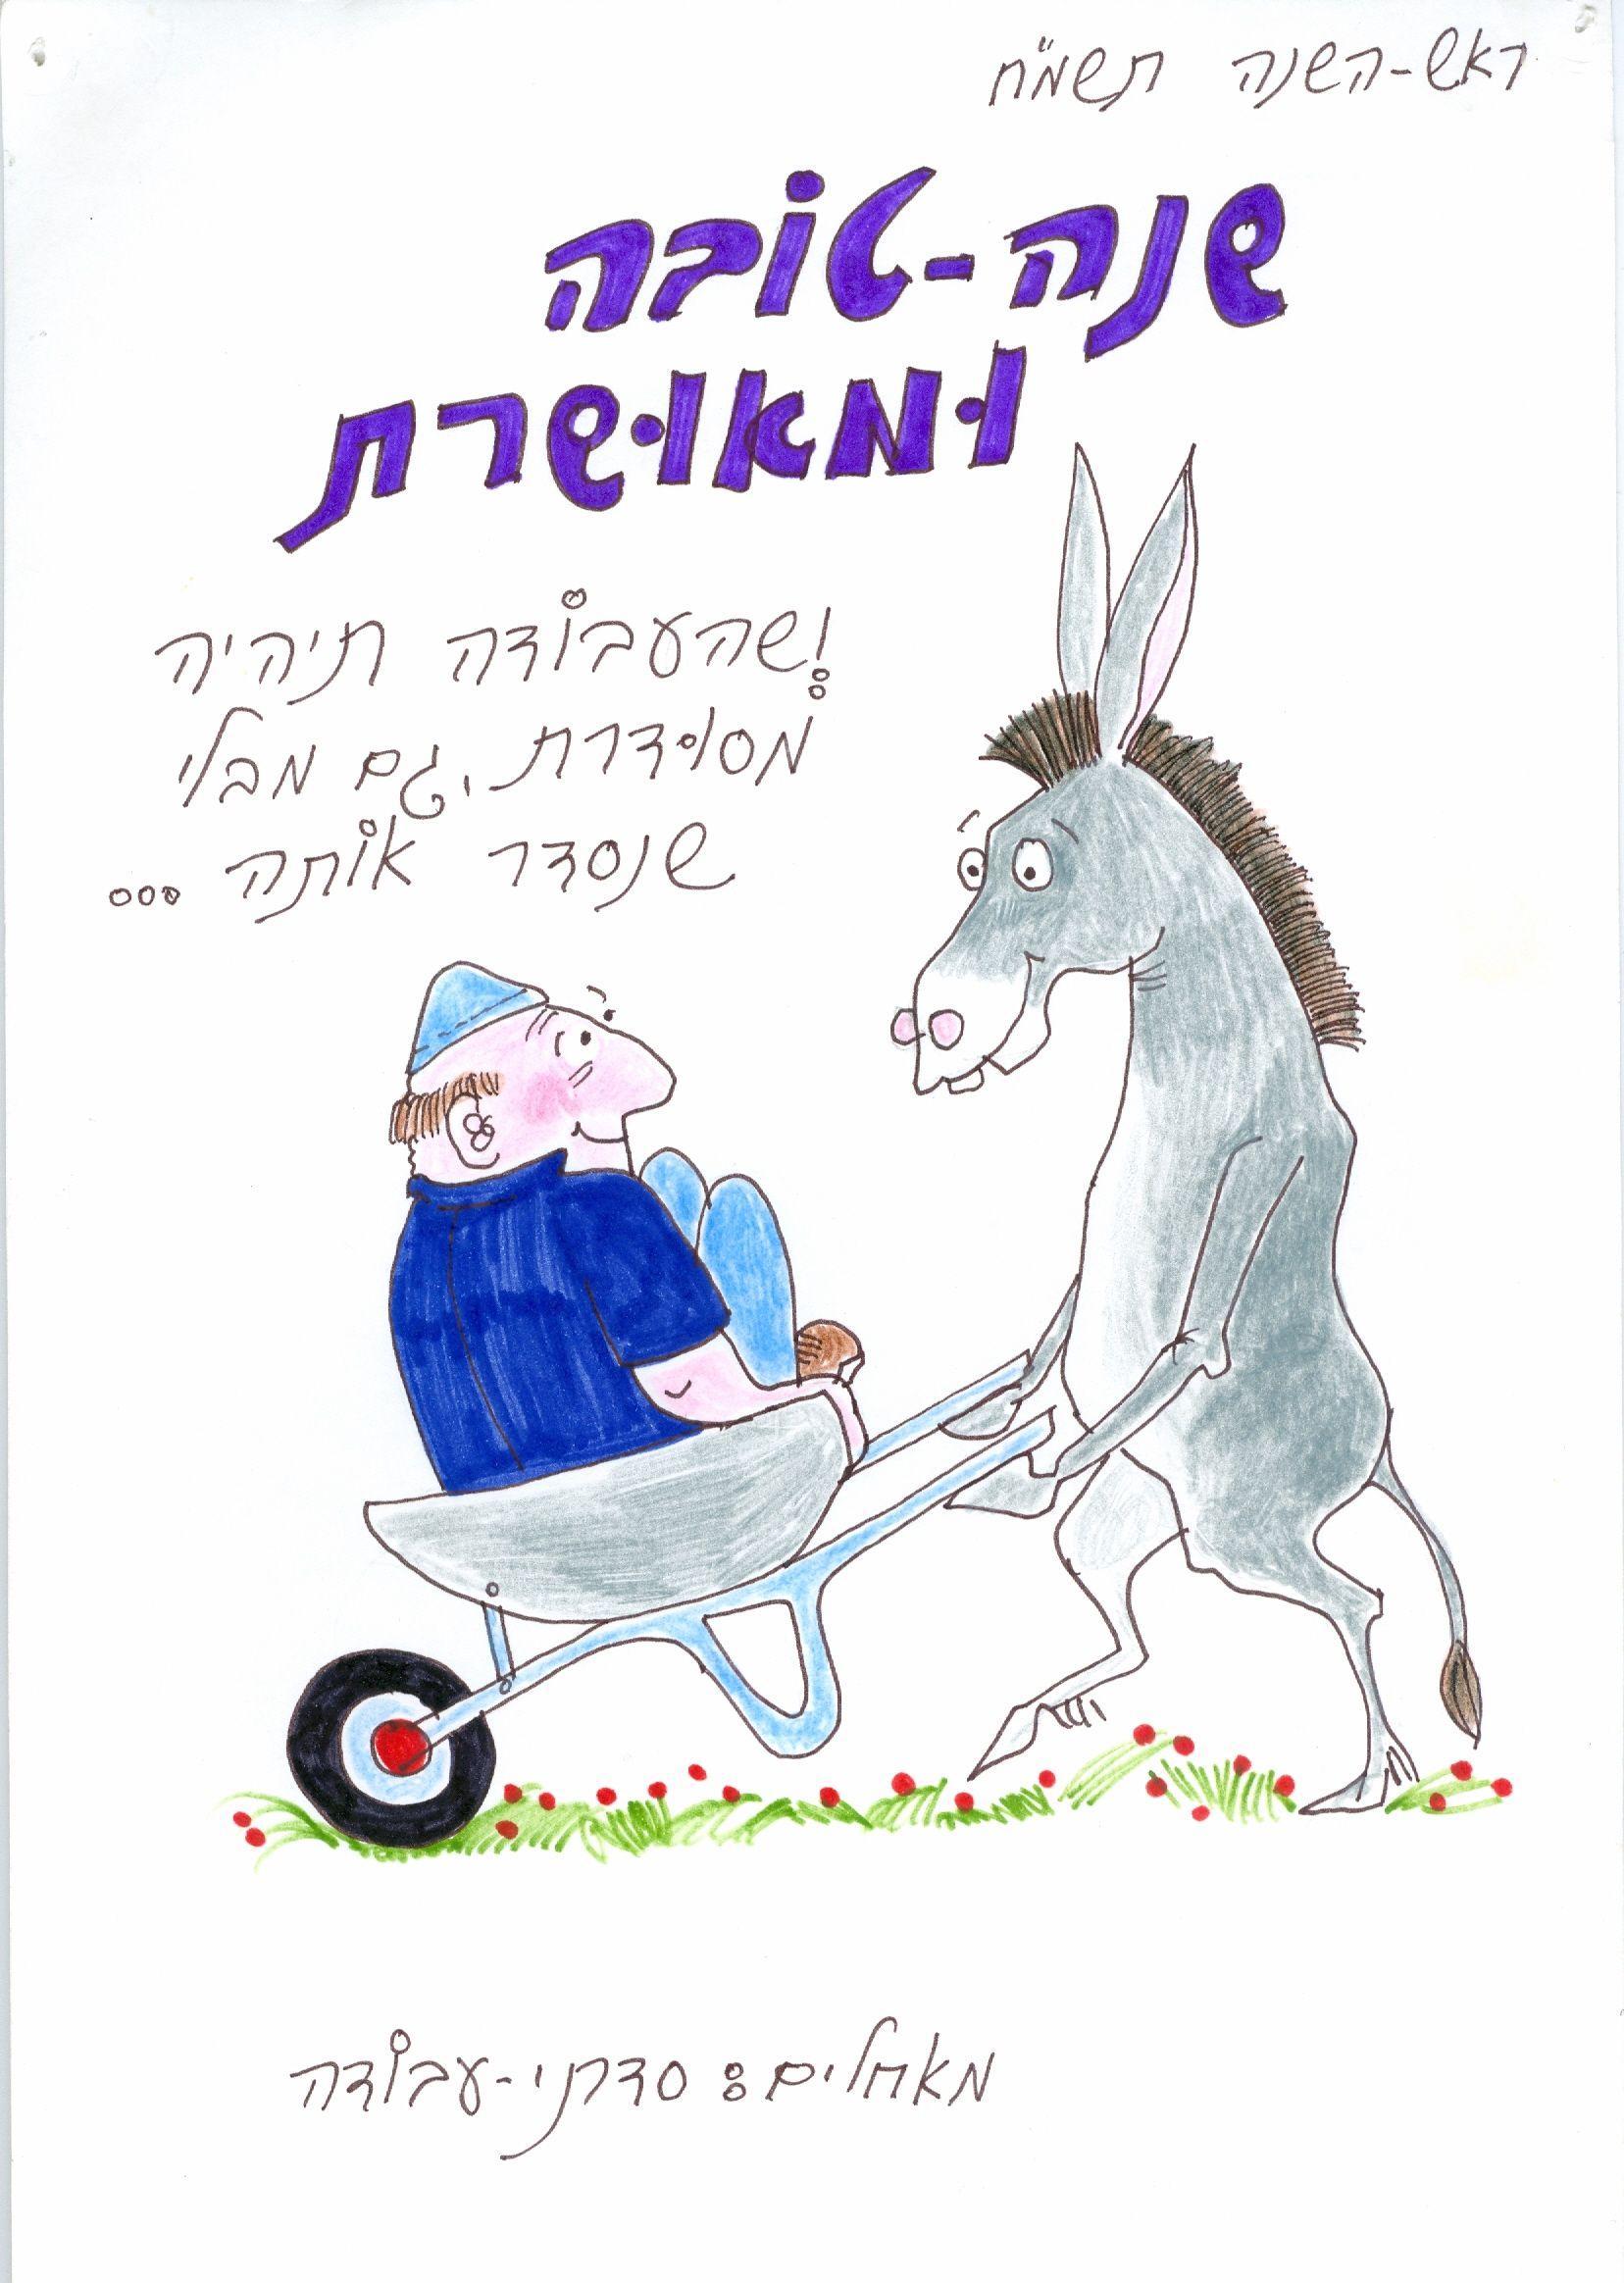 Happy New Year greeting of Givaat Brener Kibbutz, Yochanan  Shtal